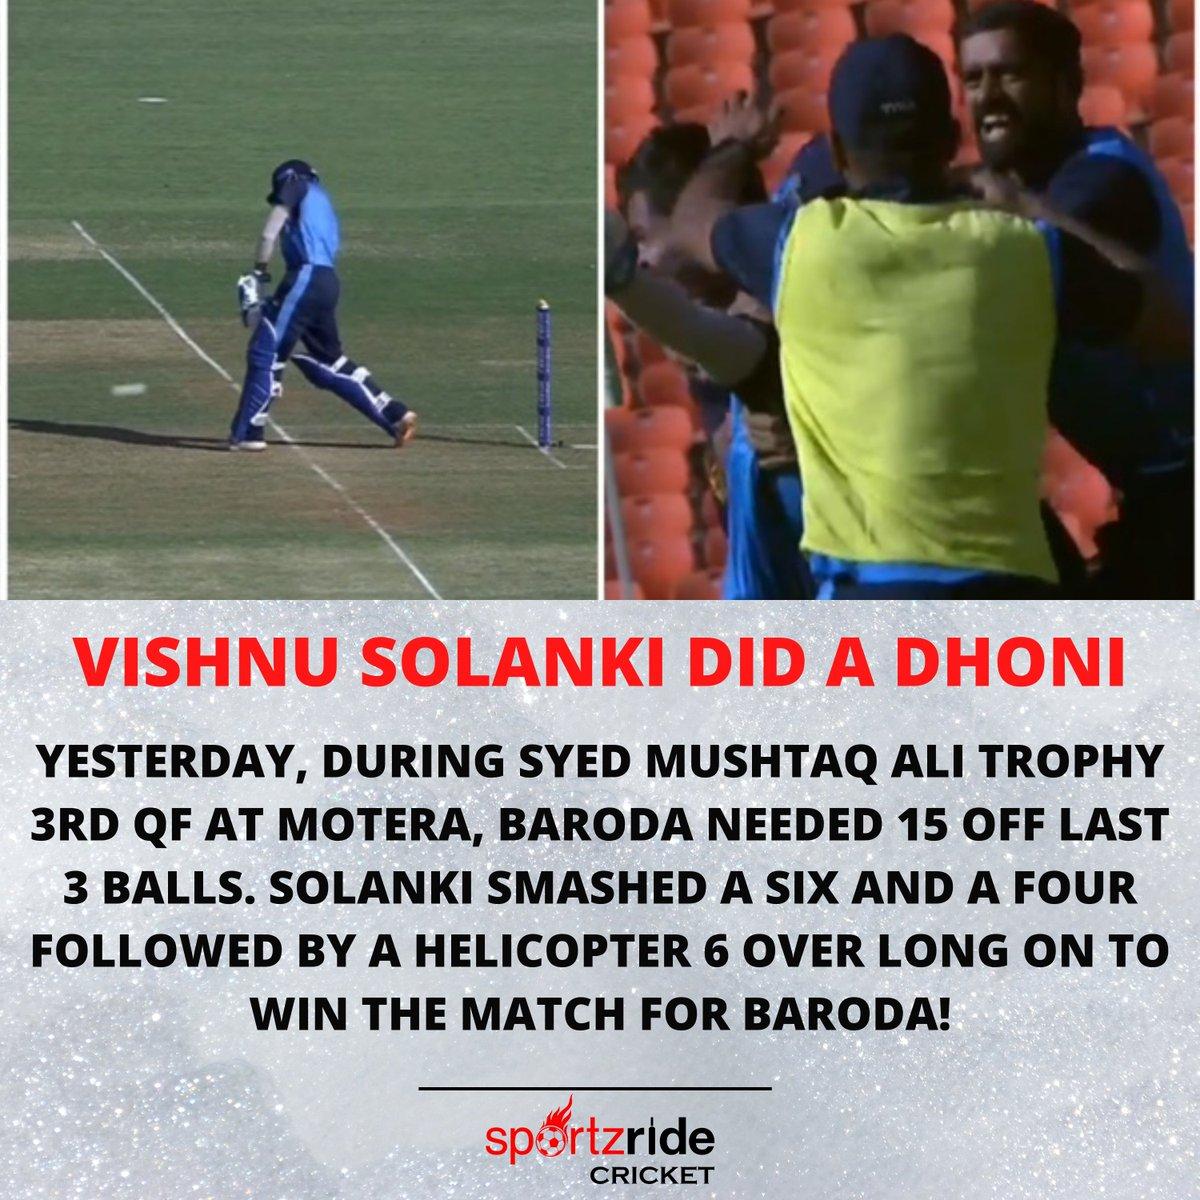 Vishnu Solanki's Heroics help Baroda seal a Semi Final Spot!  #SMAT2021 #smat #SyedMushtaqAliT20 #SyedMushtaqAliTrophy2021 #vishnusolanki #HARvBDA